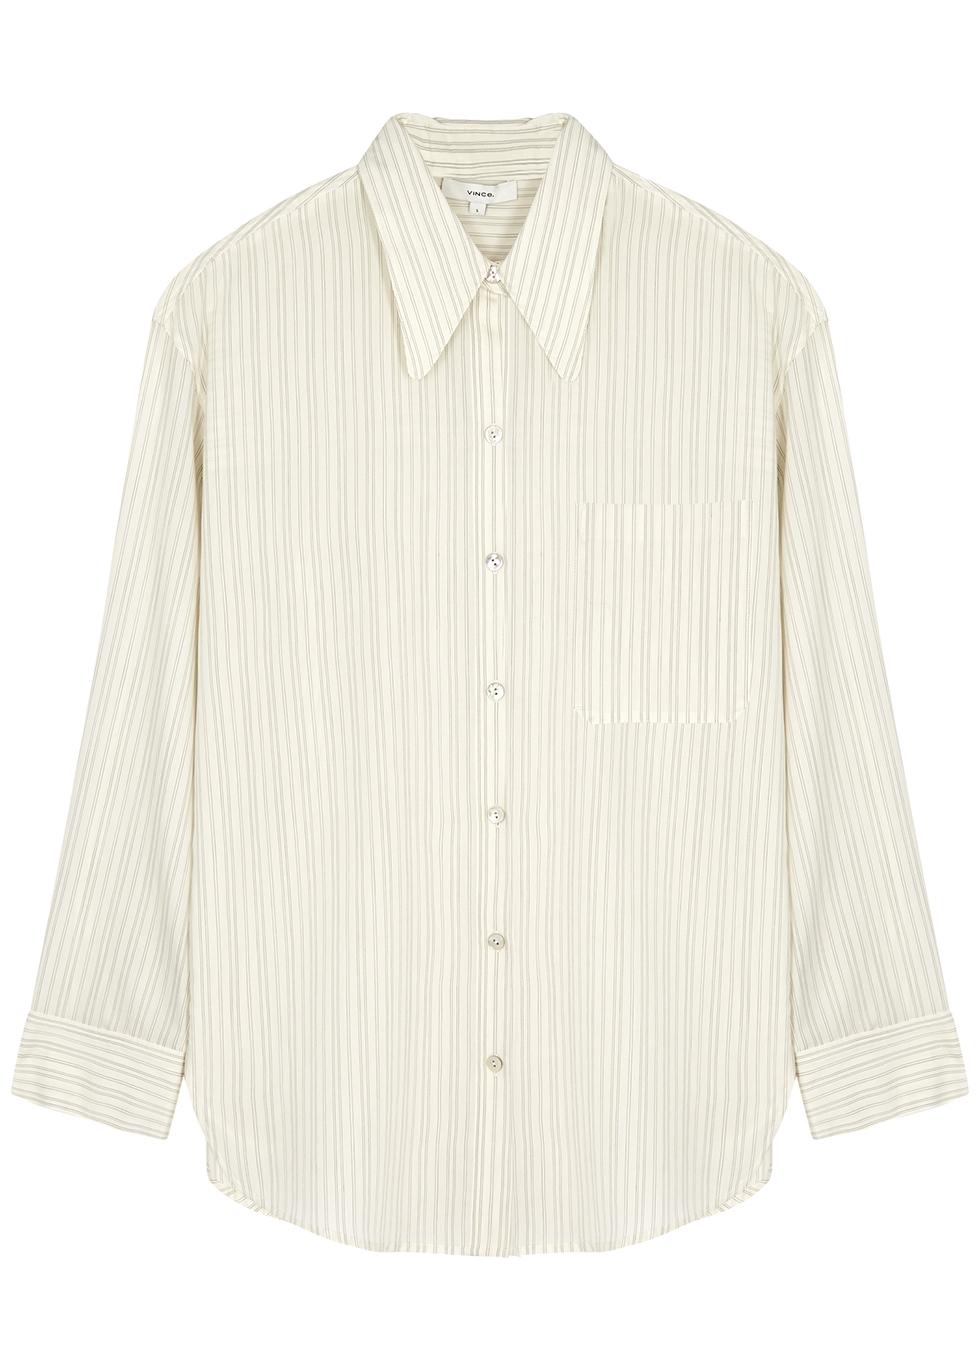 Ivory pinstriped shirt